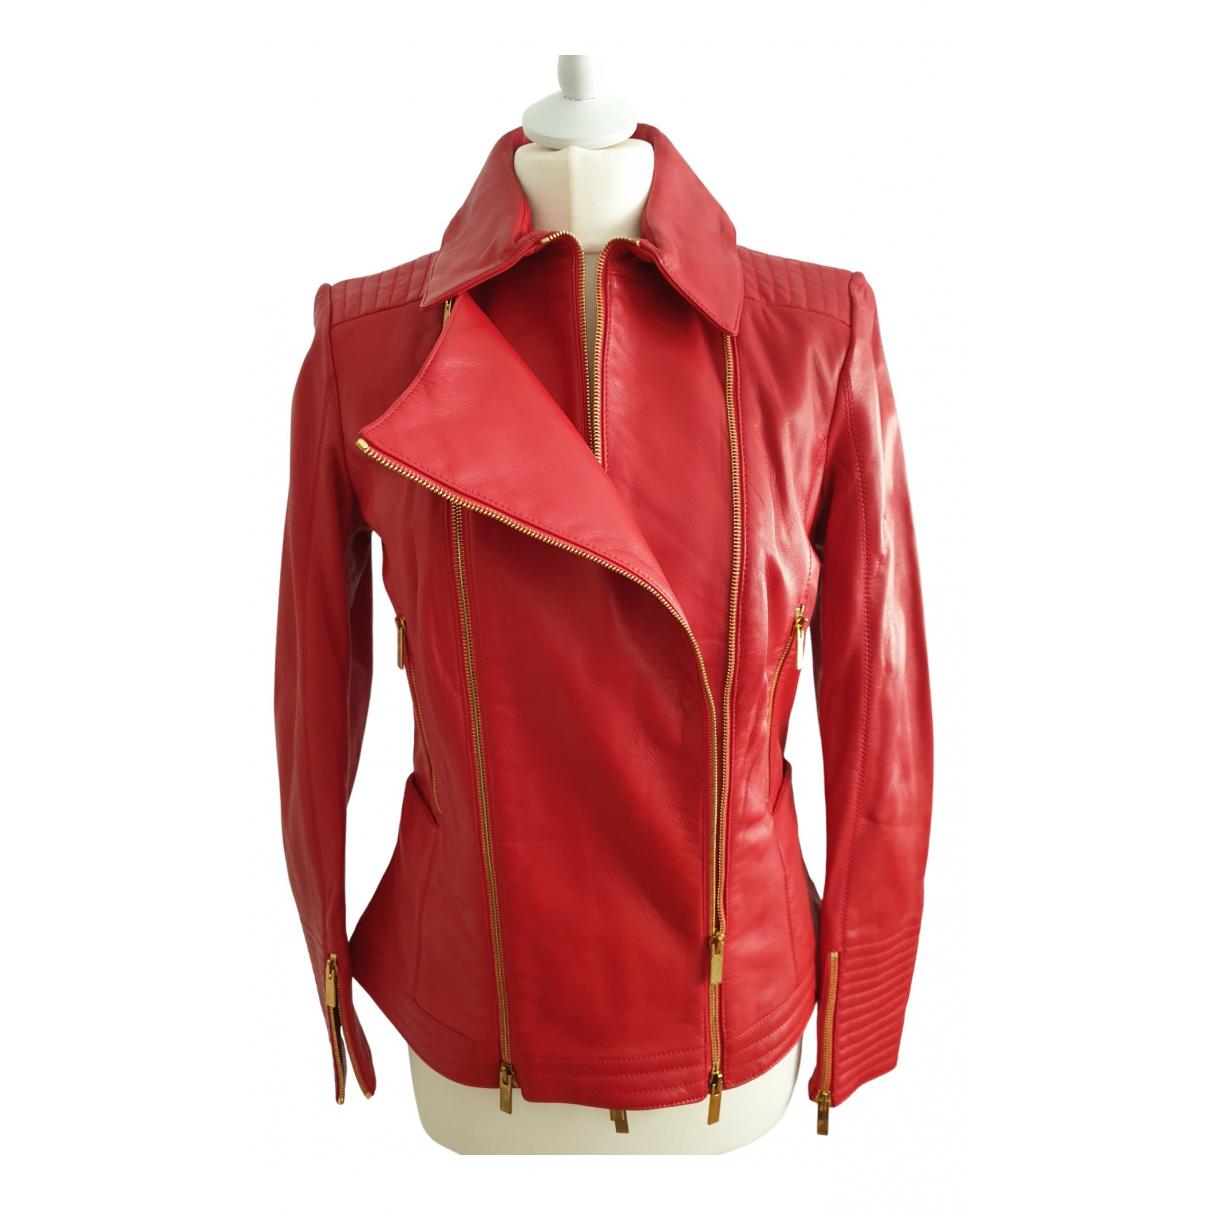 Blumarine \N Red Leather jacket for Women 44 IT